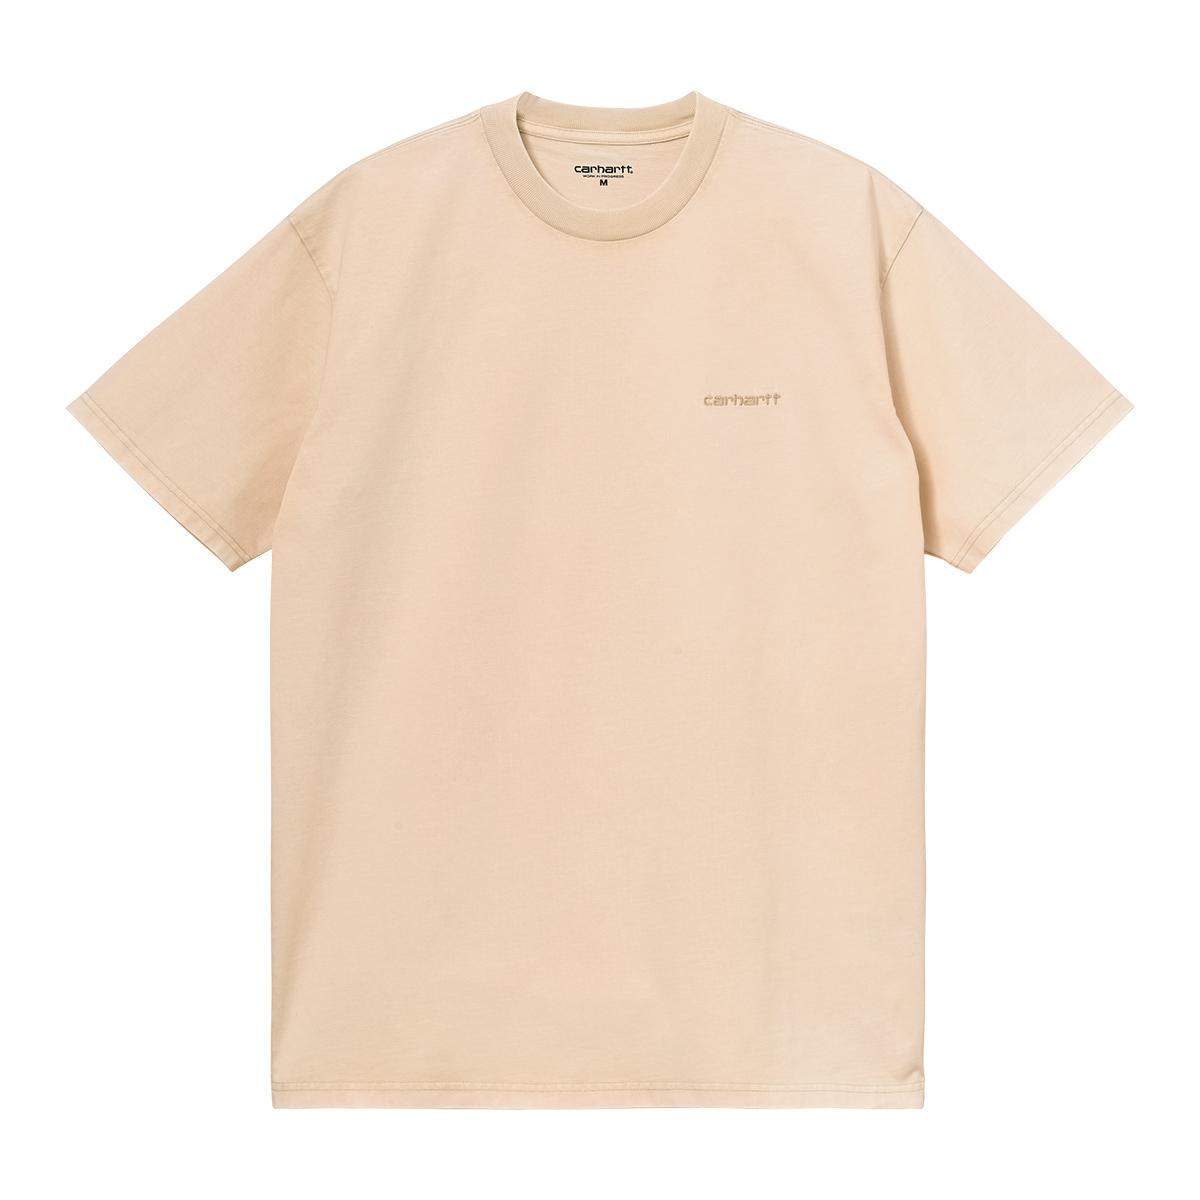 S/S Mosby Script T-Shirt